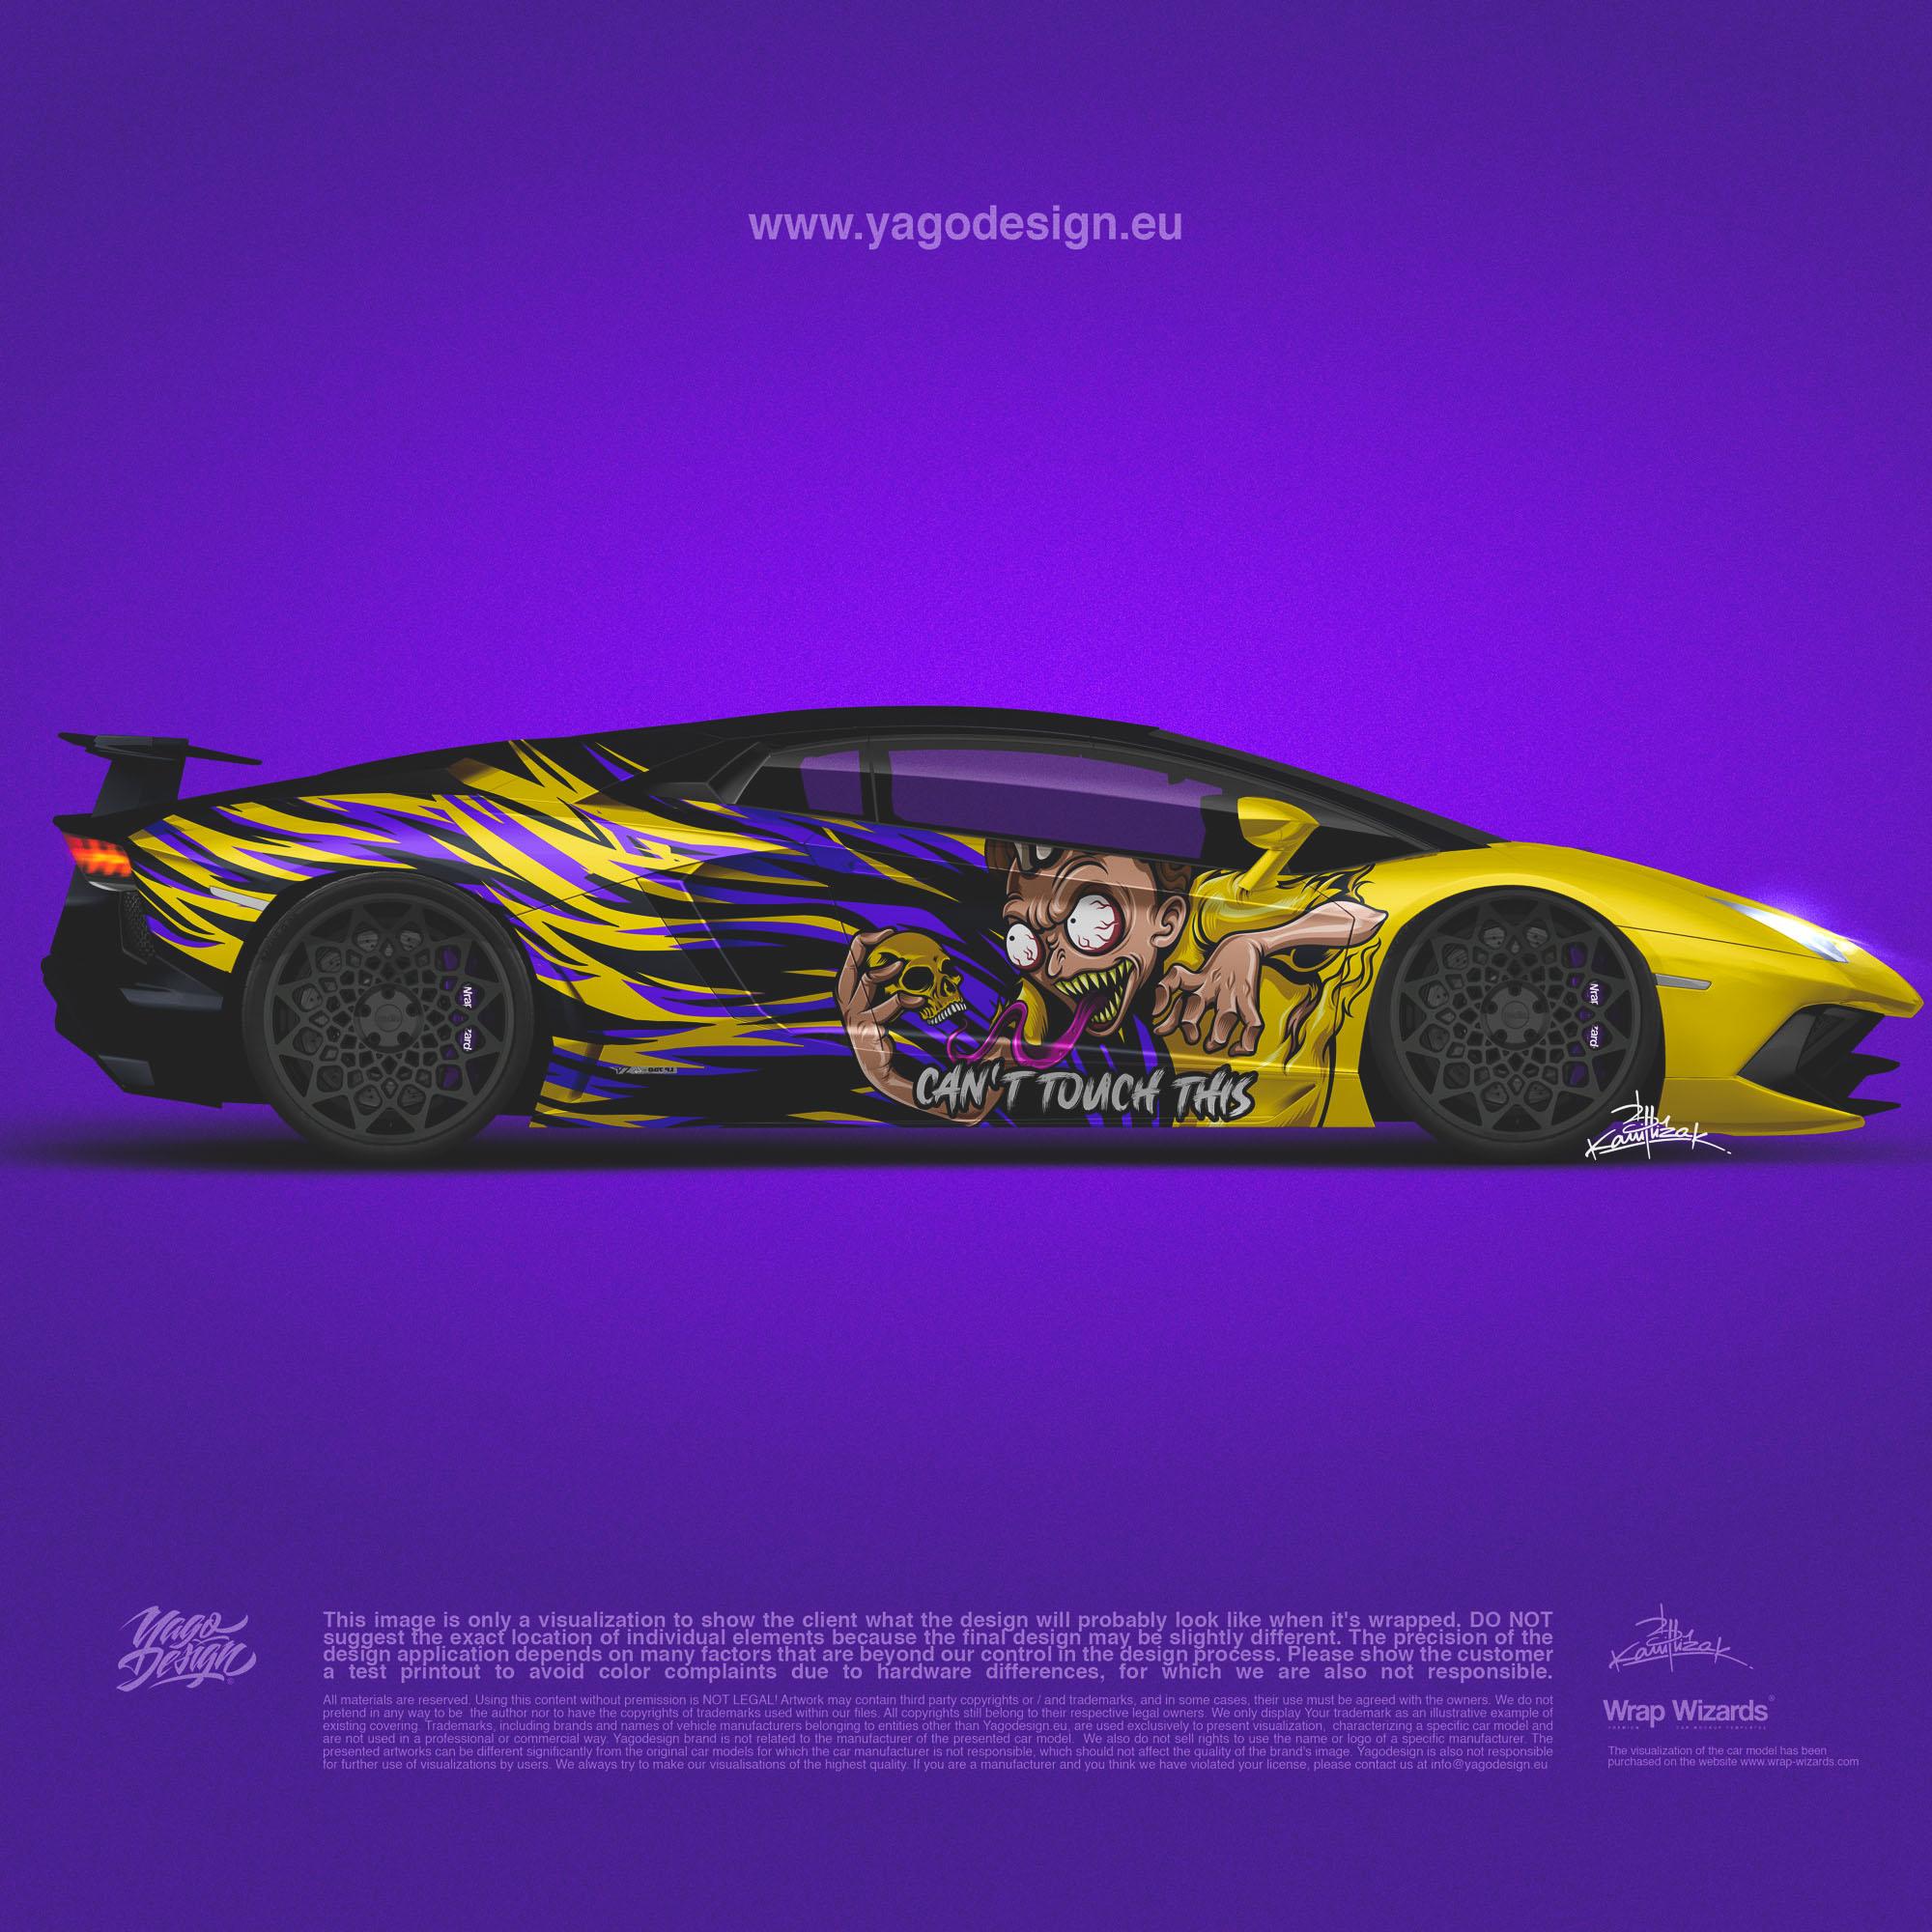 Lamborghini-Aventador-LP750-4-SV-Roadster-2016-sv2